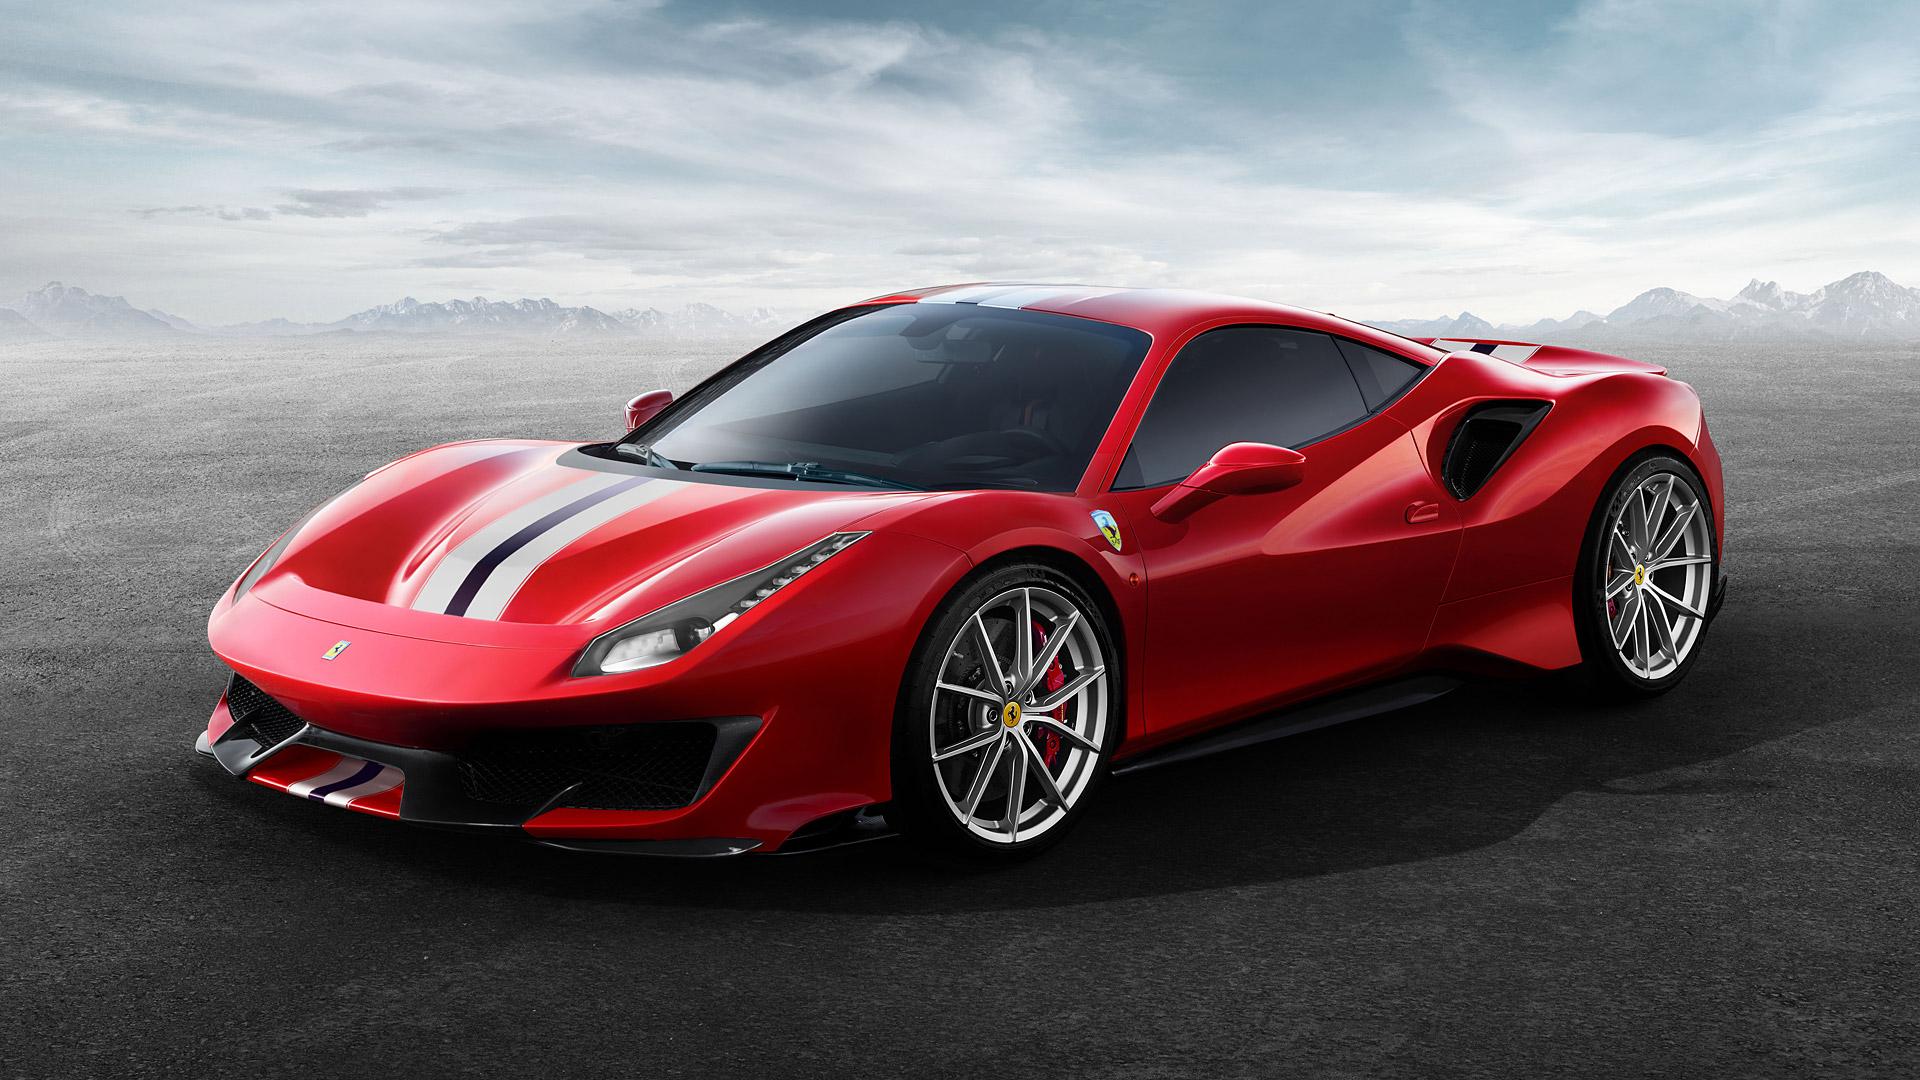 2019 Ferrari 488 Pista Wallpapers HD Images   WSupercars 1920x1080